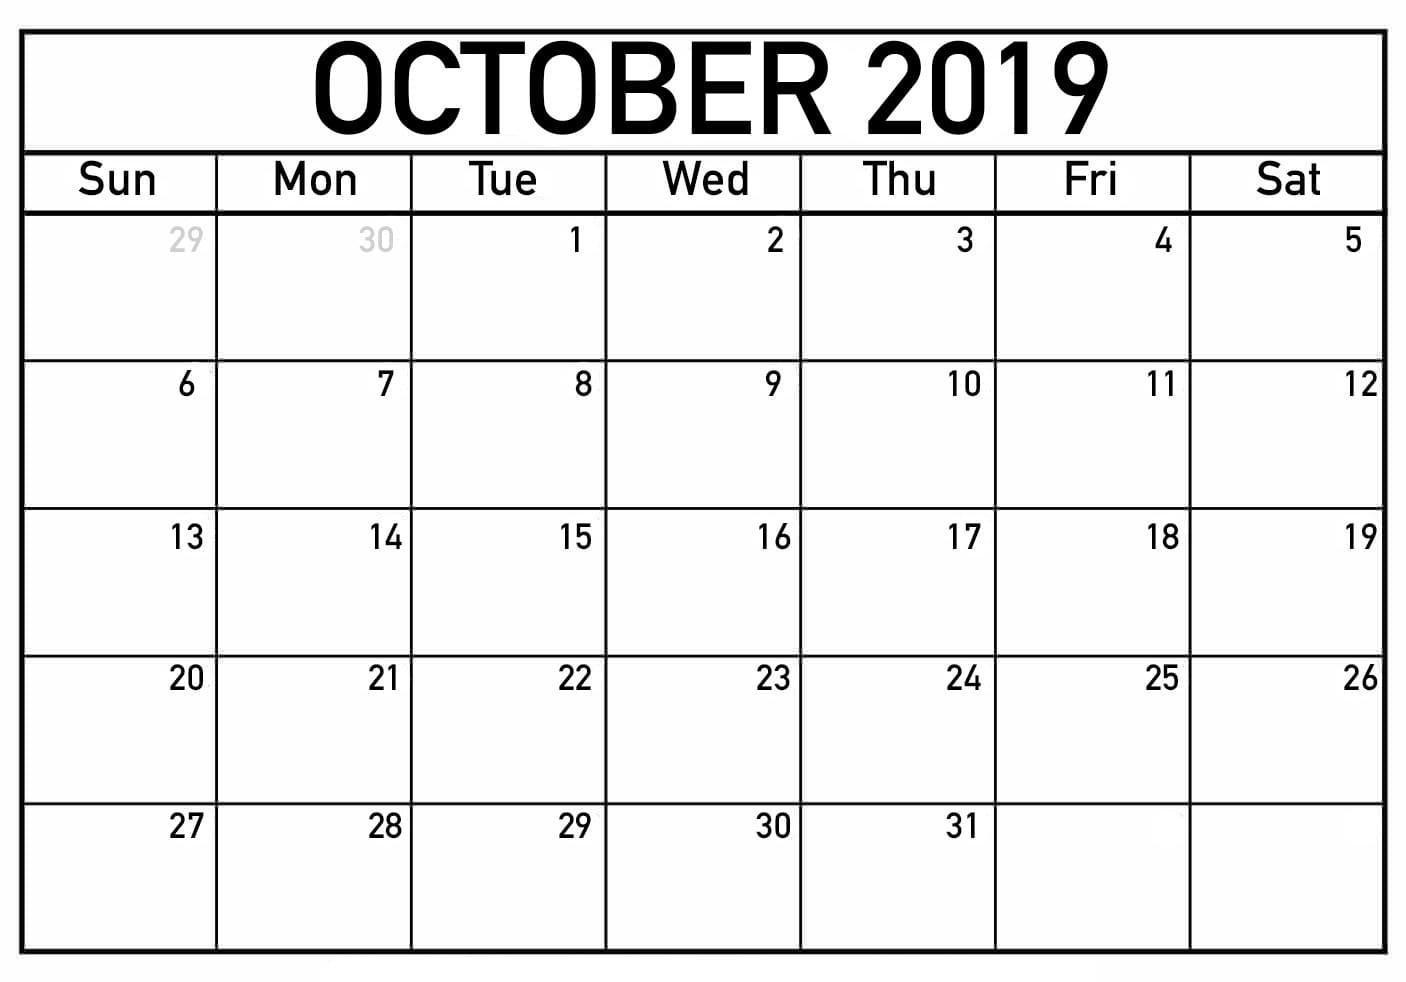 Free Printable October 2019 Calendar Planner Templates - Latest within Full Moon Calendar 2019 Printable October